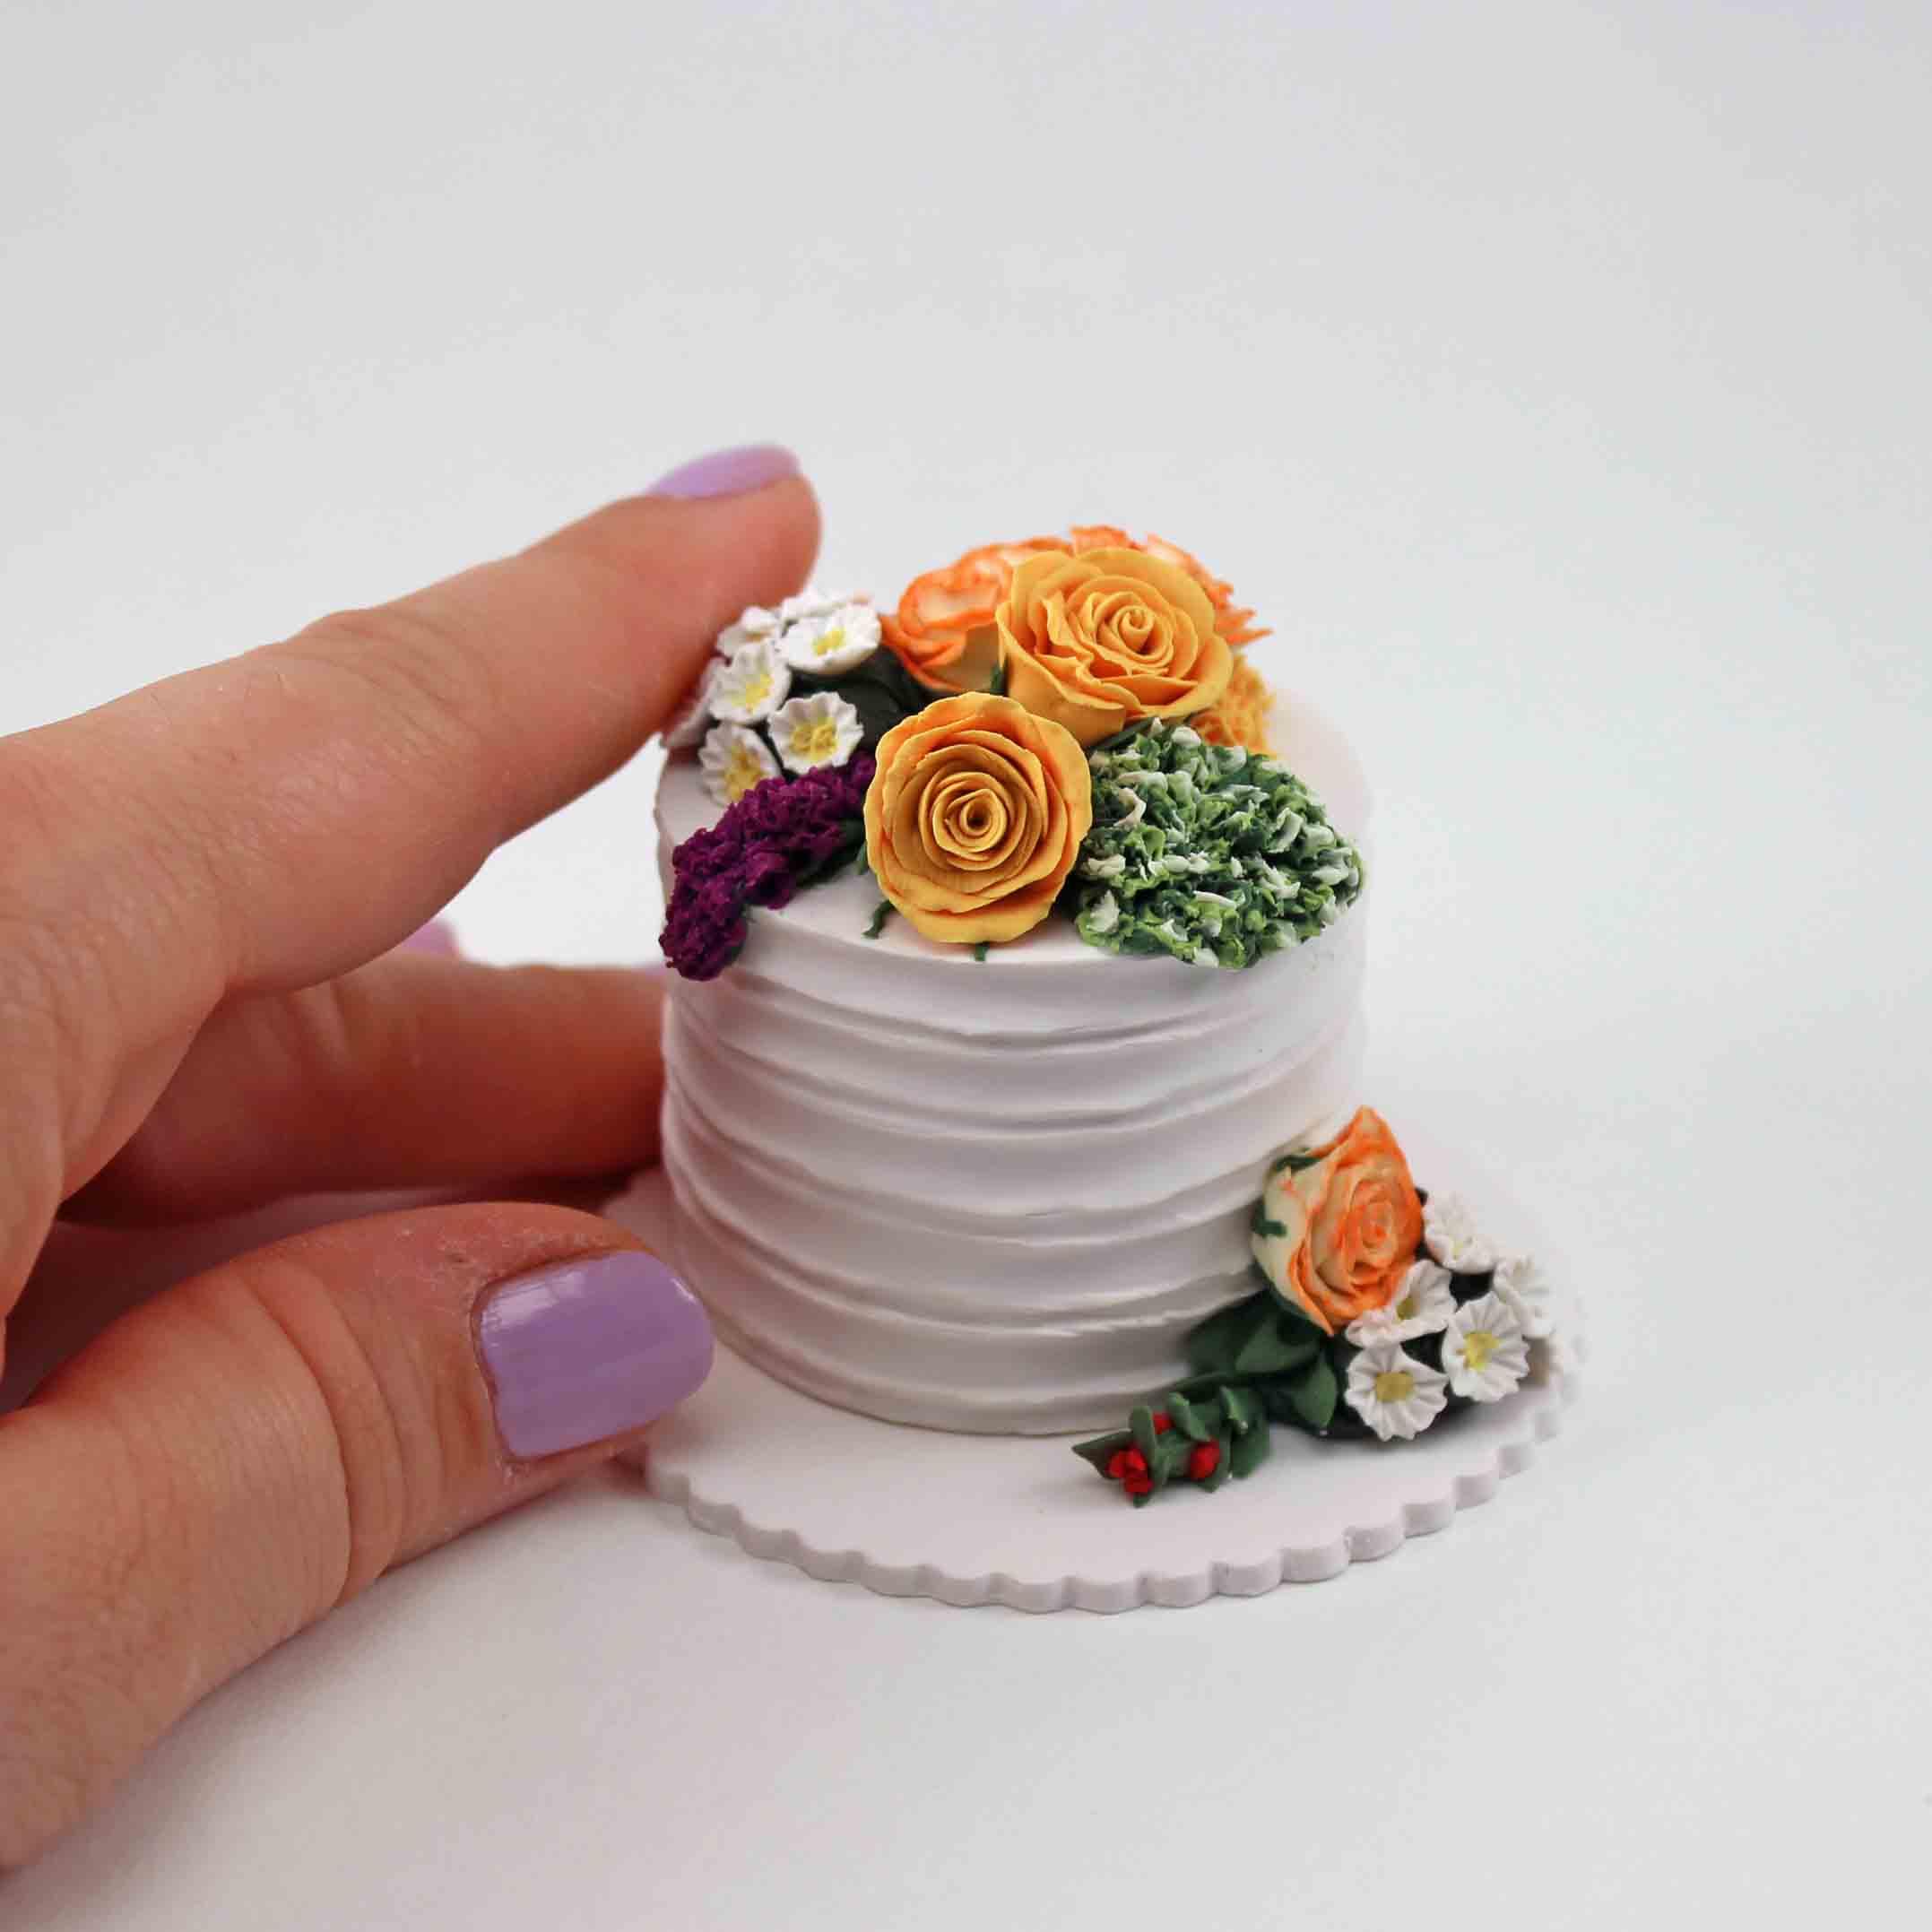 mini replica of one tier wedding cake replica.jpg